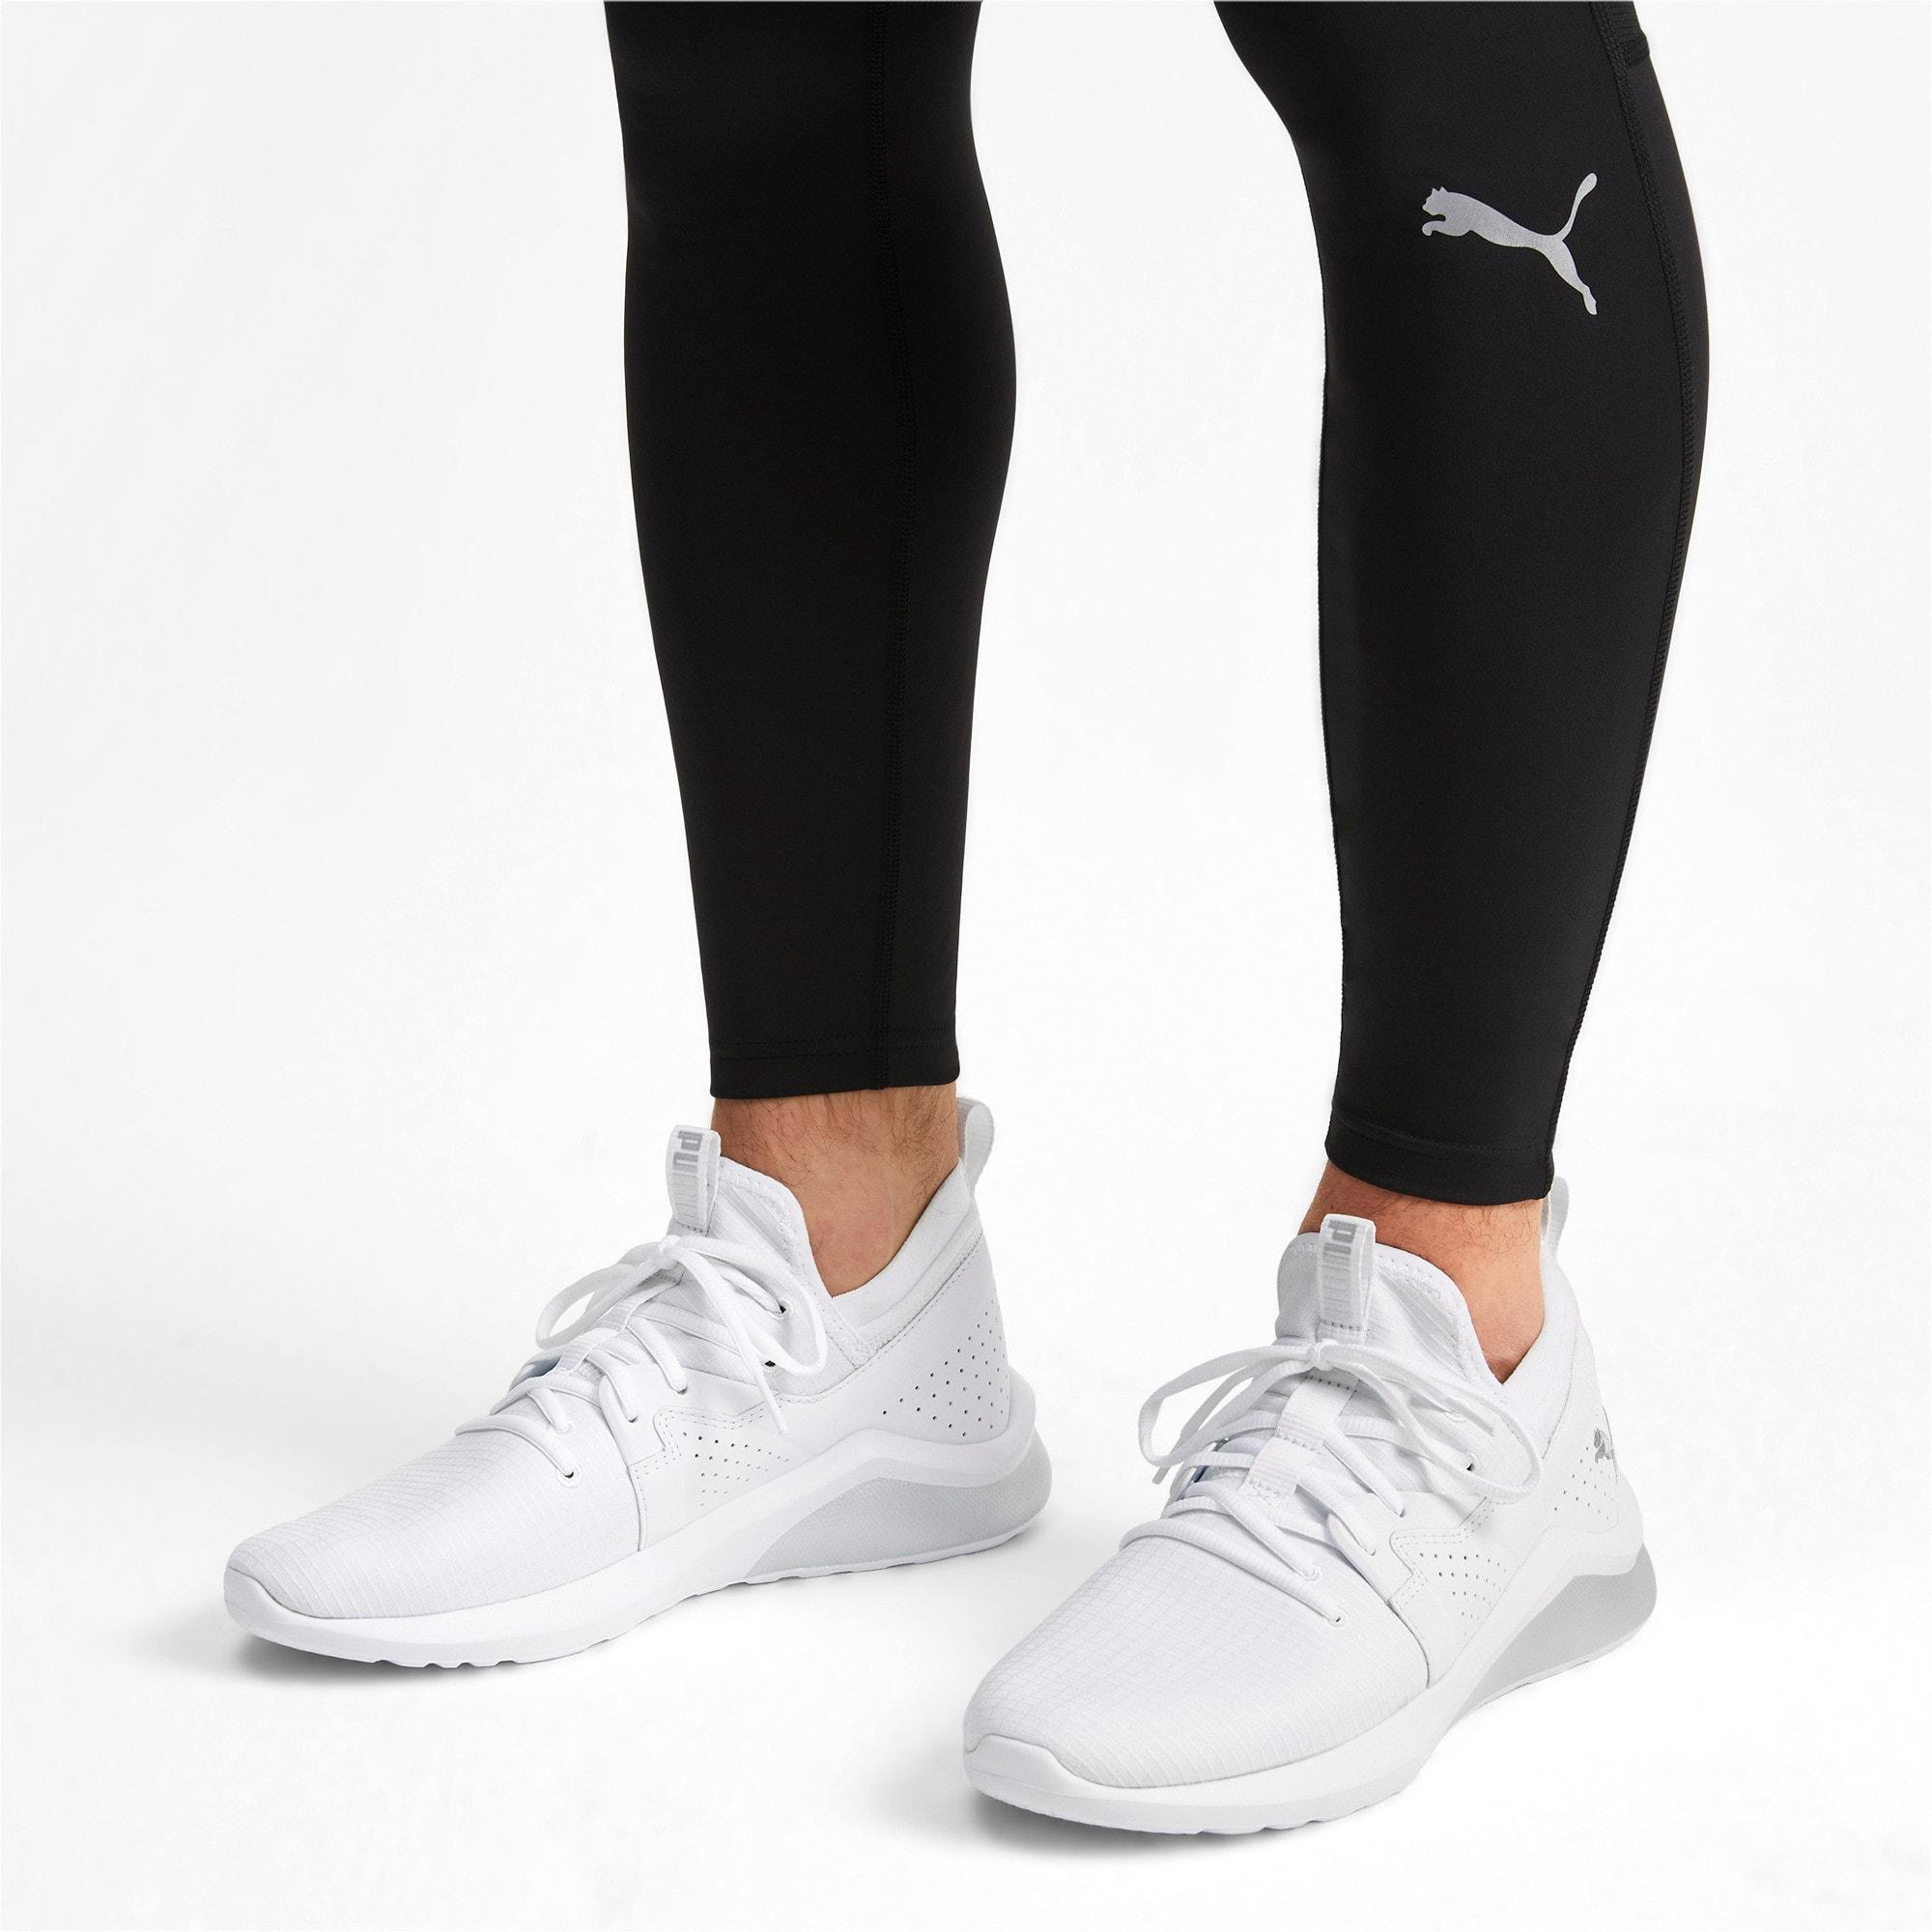 Thumbnail 3 of Emergence Lights Men's Running Shoes, Puma White-Puma Silver, medium-IND